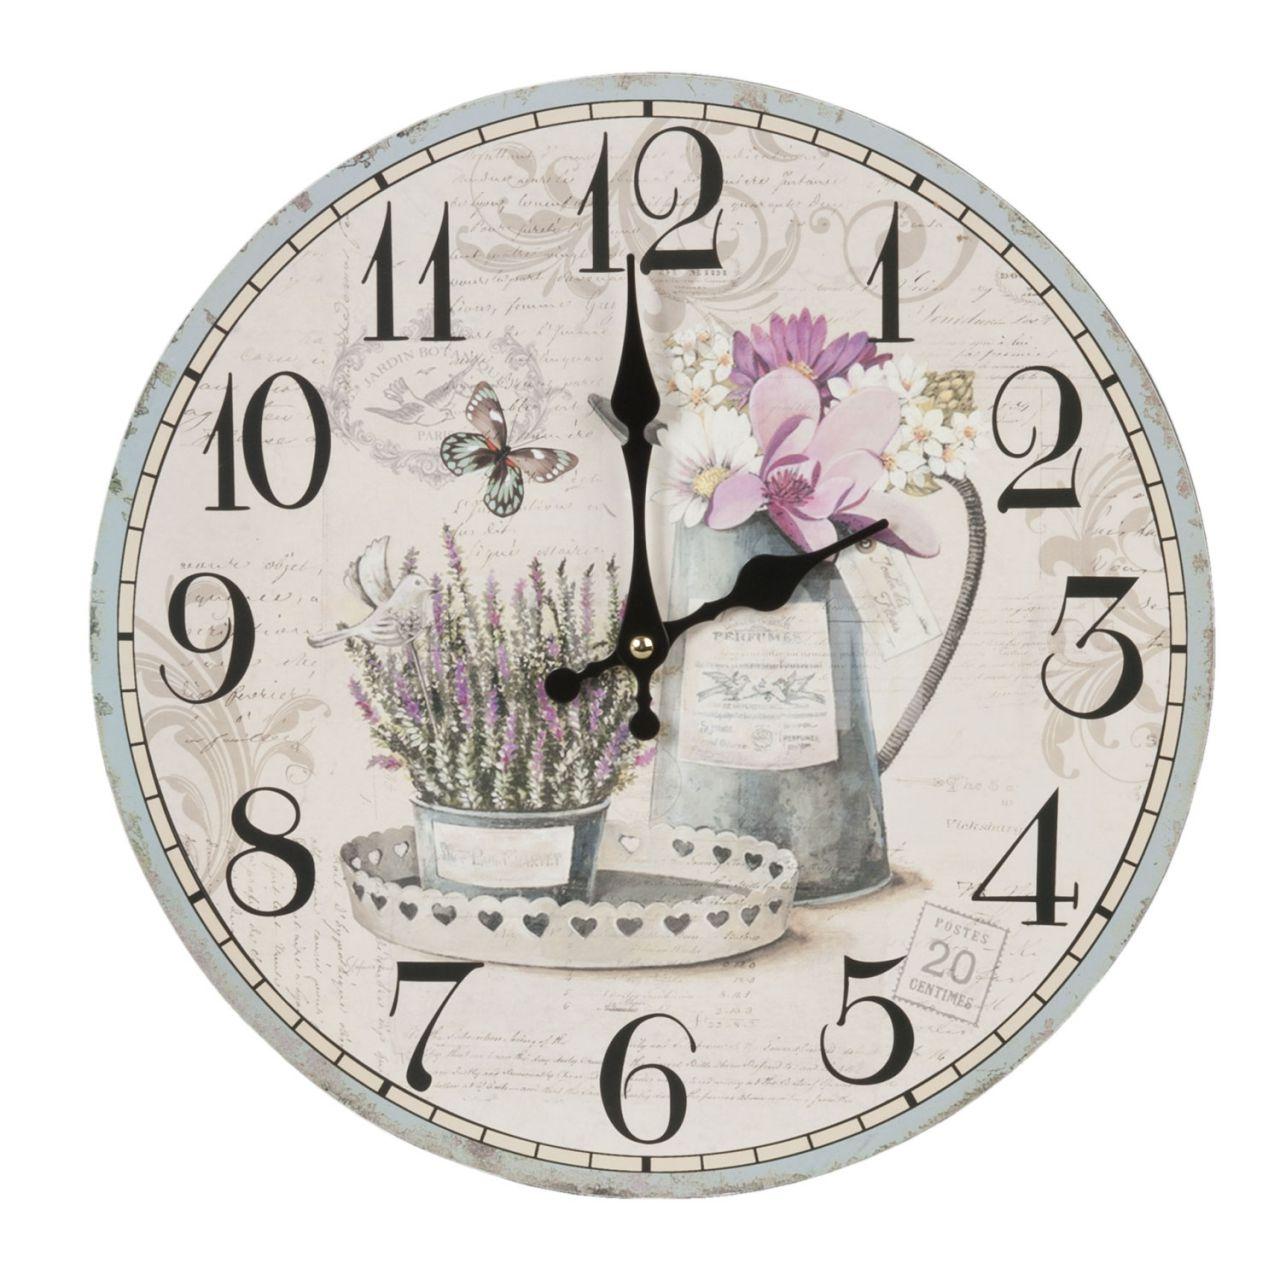 Wanduhr Lavendel Schmetterling Clayre & Eef